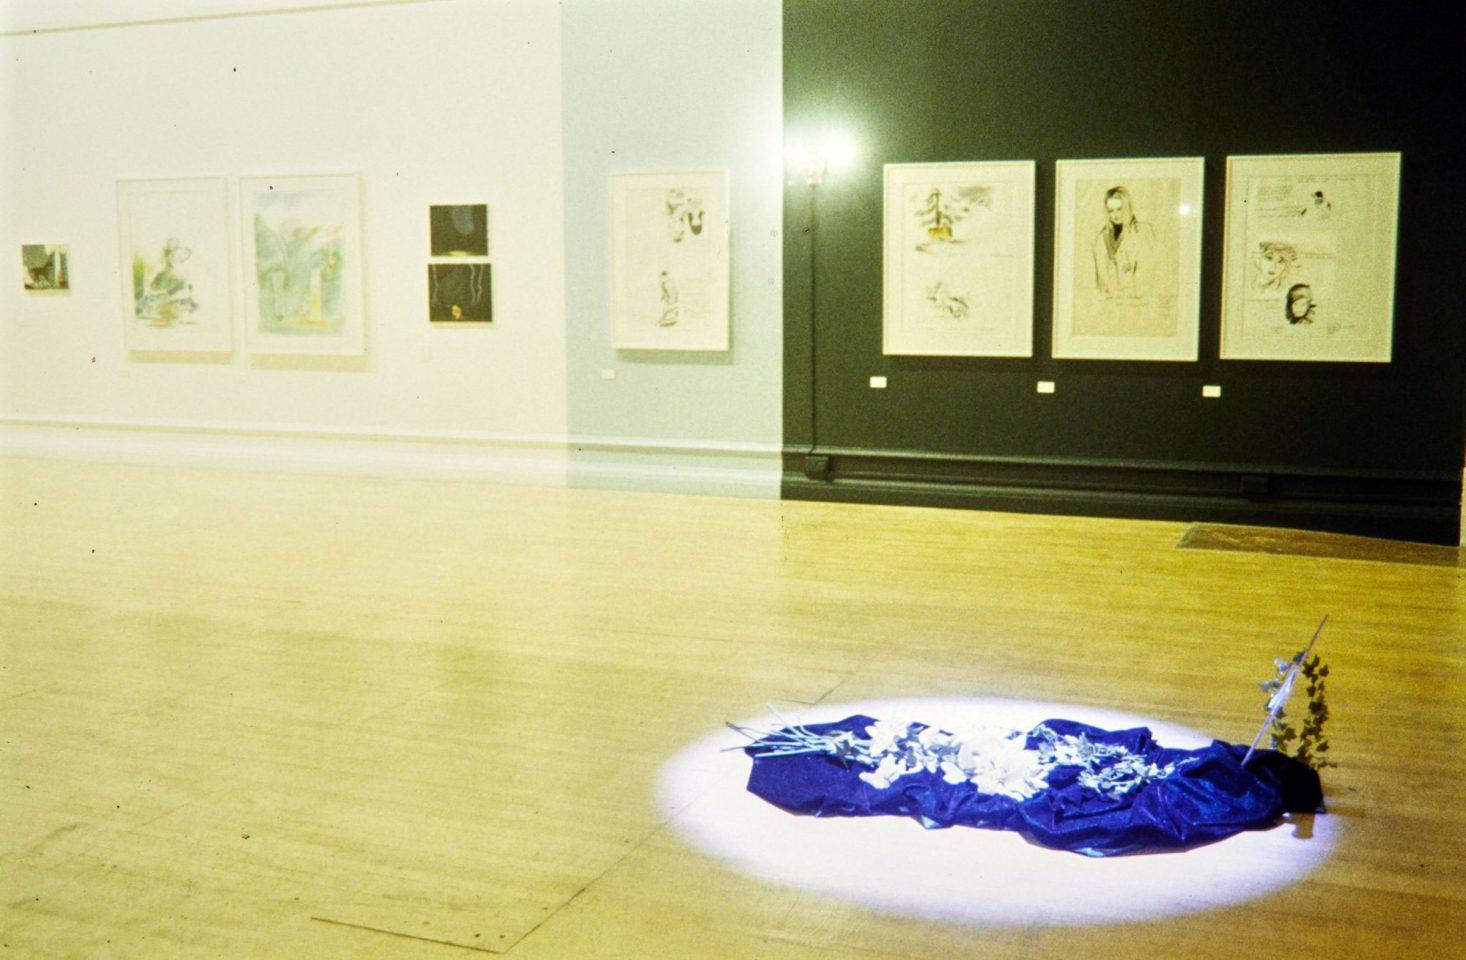 Karen Kilimnik: Solo Exhibition